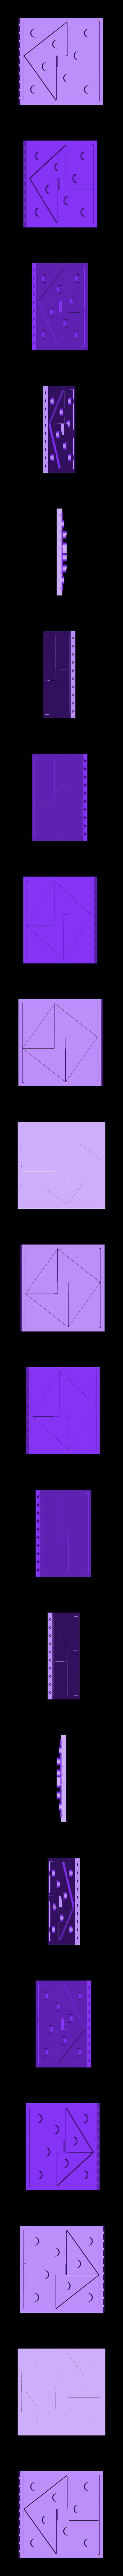 PythagoreanMoreDetailsZBSJ2.stl Download free STL file Pythagorean Theorem, Visual Proof, Chinese Origin • 3D printer template, LGBU